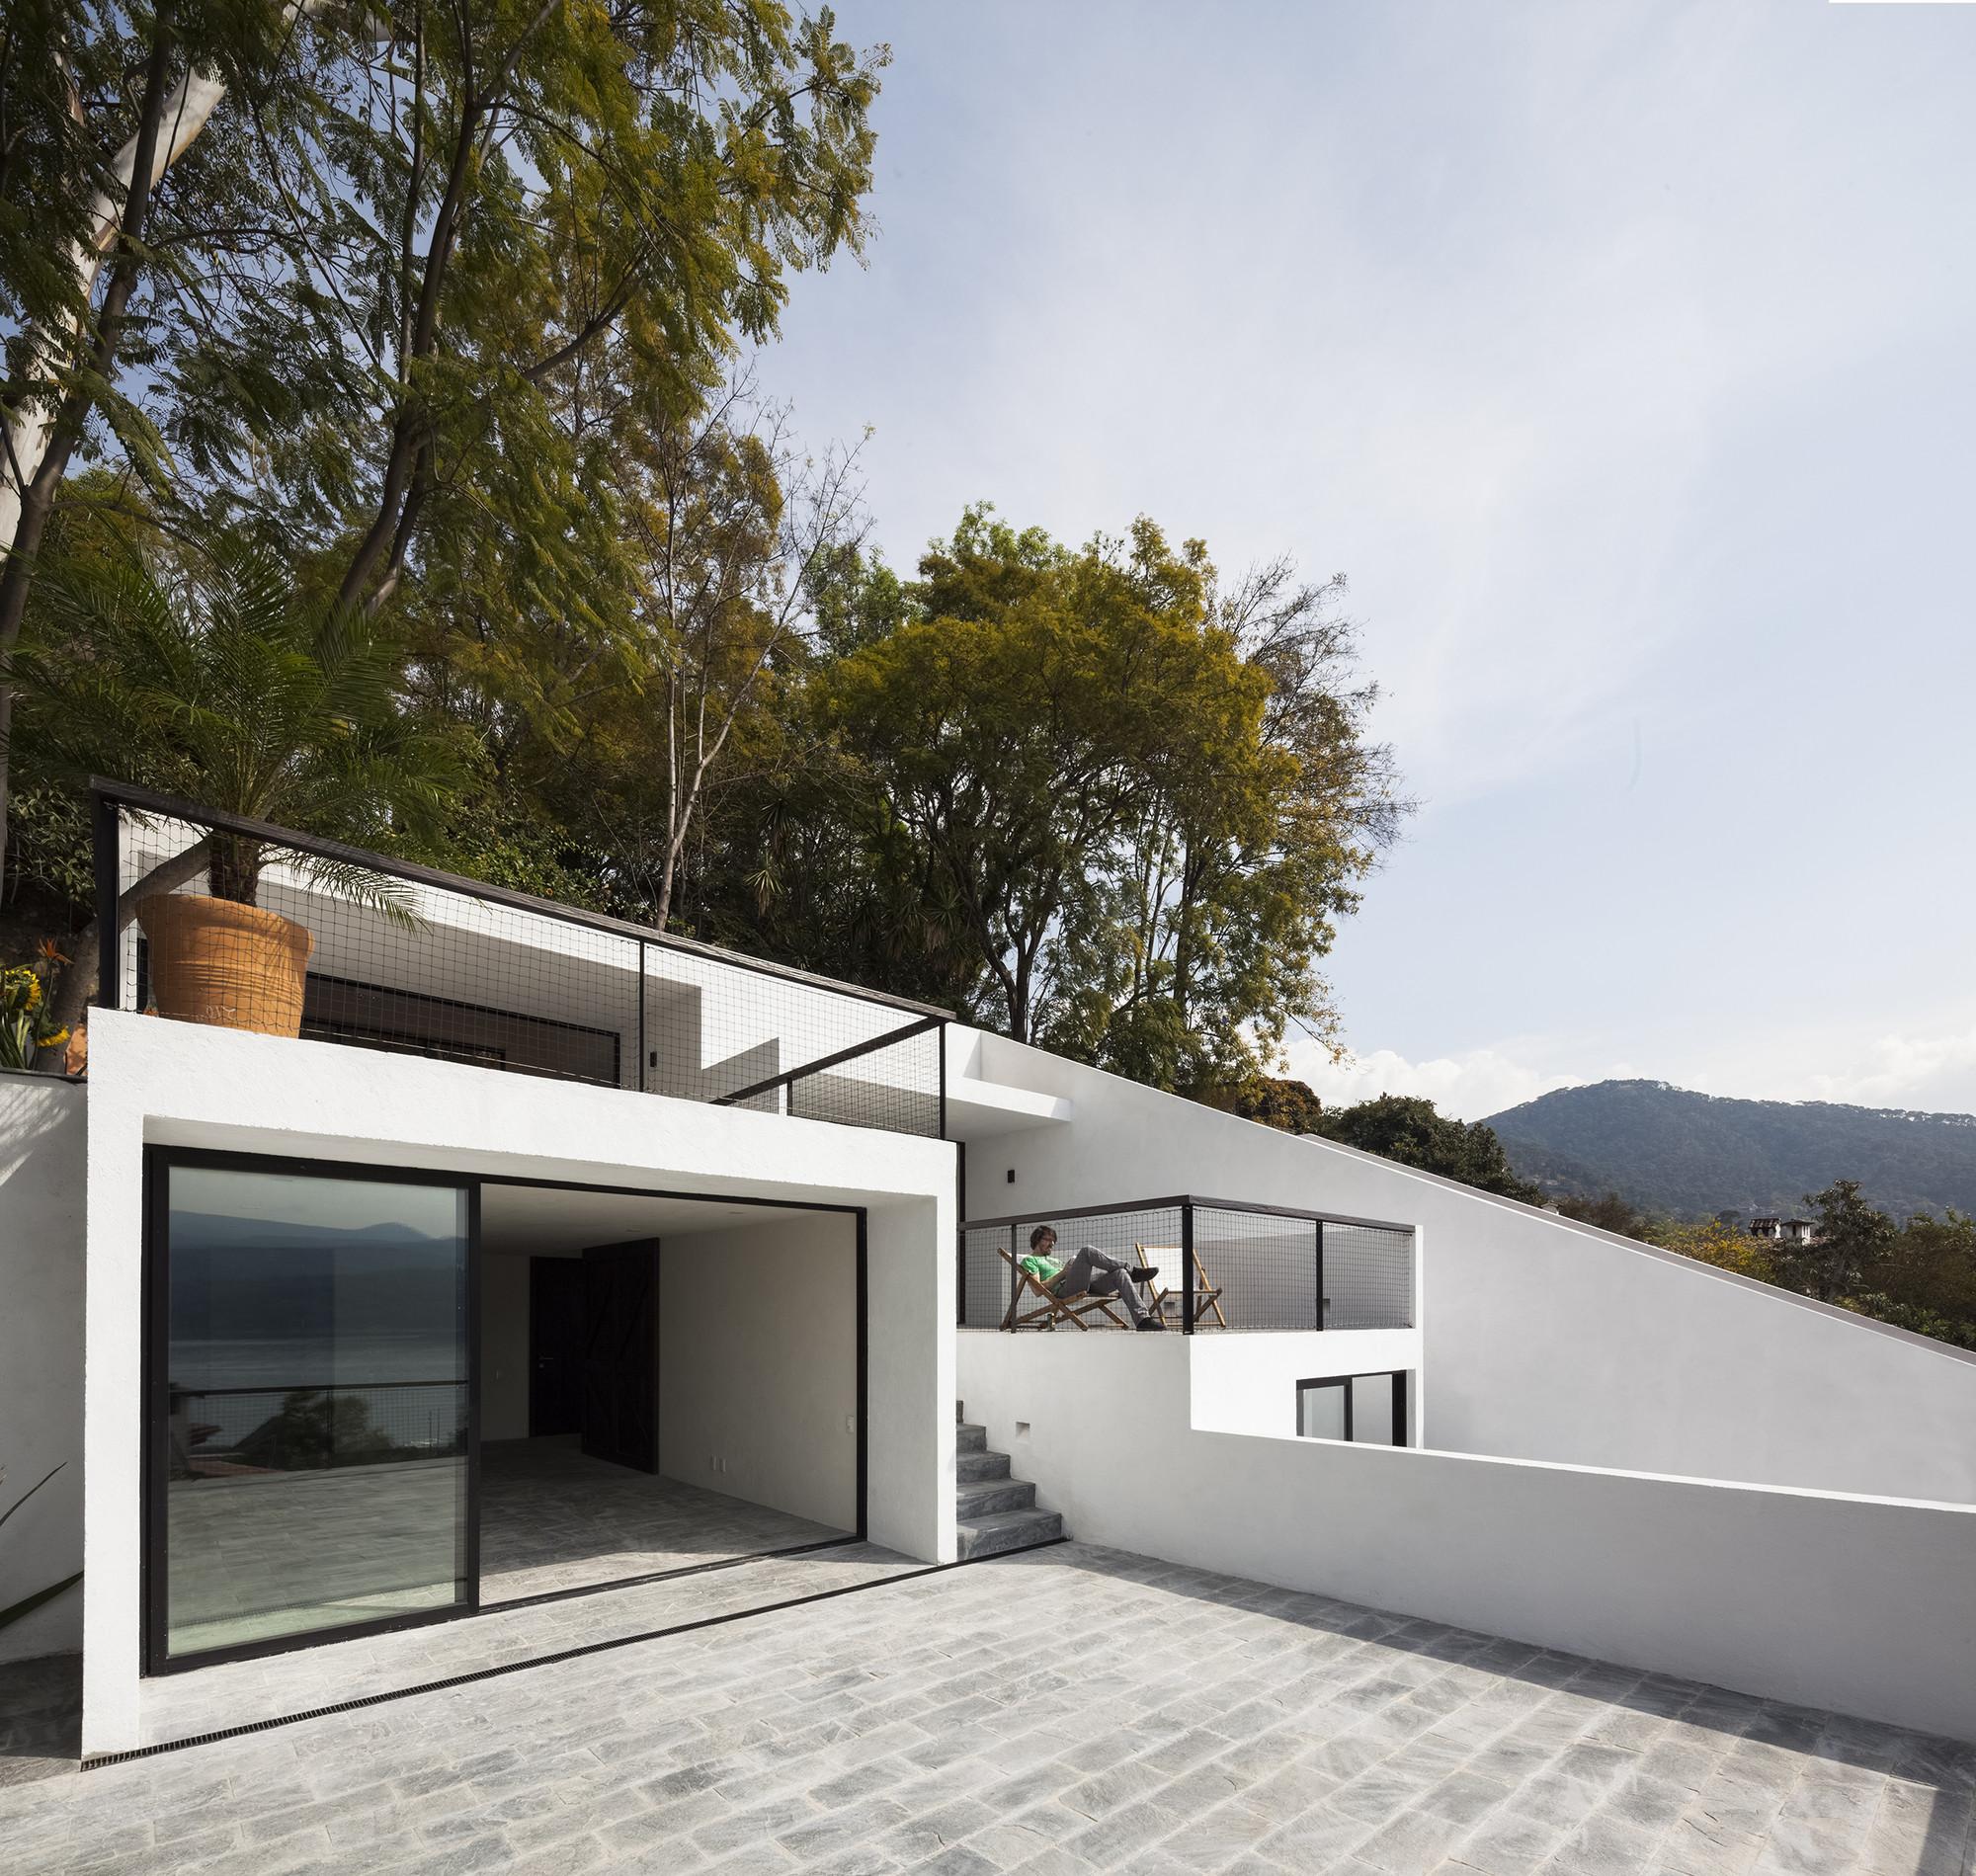 Galeria de casas mestre dellekamp arquitectos 9 for Arquitectos para casas